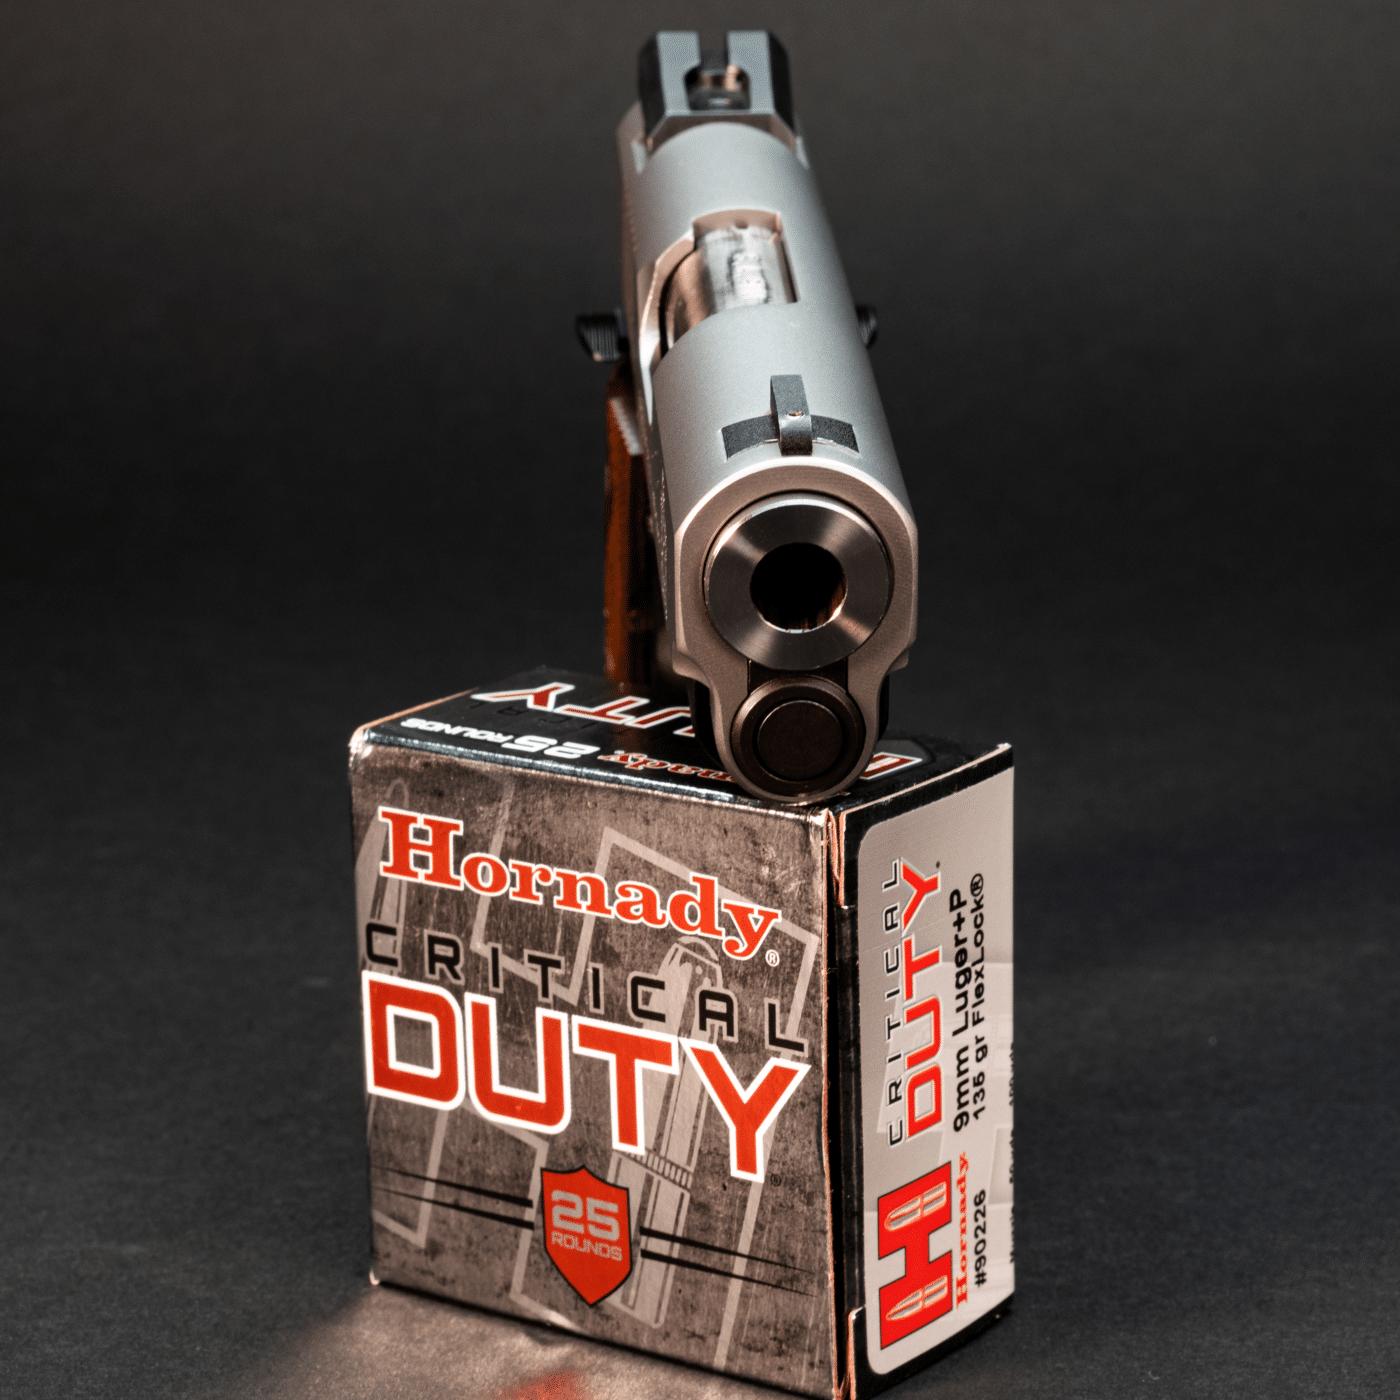 Hornady Critical Duty ammo with Springfield Ronin 1911